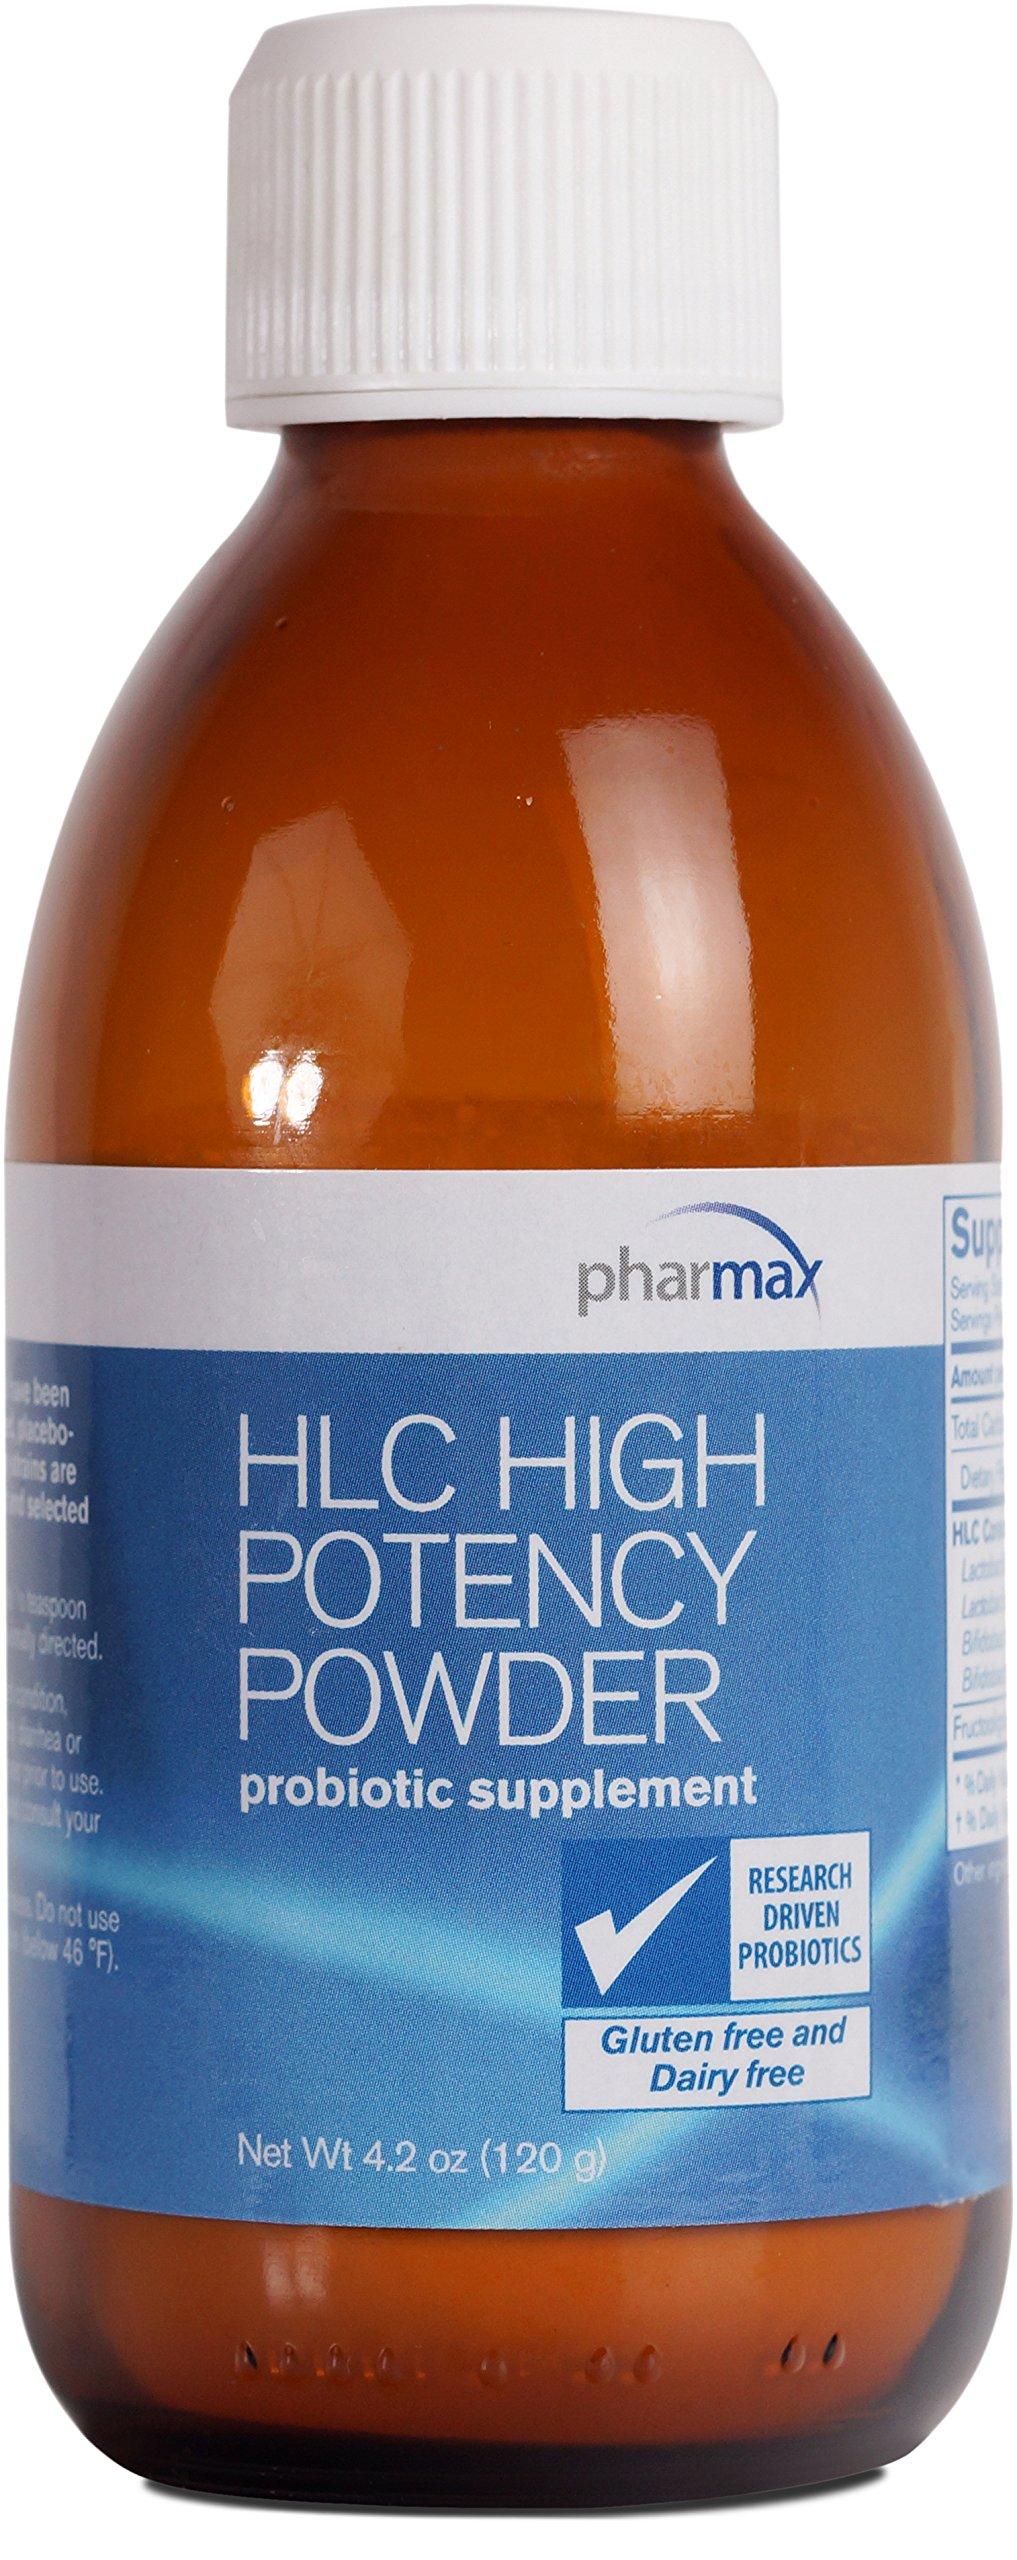 Pharmax - HLC High Potency Powder - Probiotics to Promote Gastrointestinal Health in Adults* - 4.2 oz. (120 g)